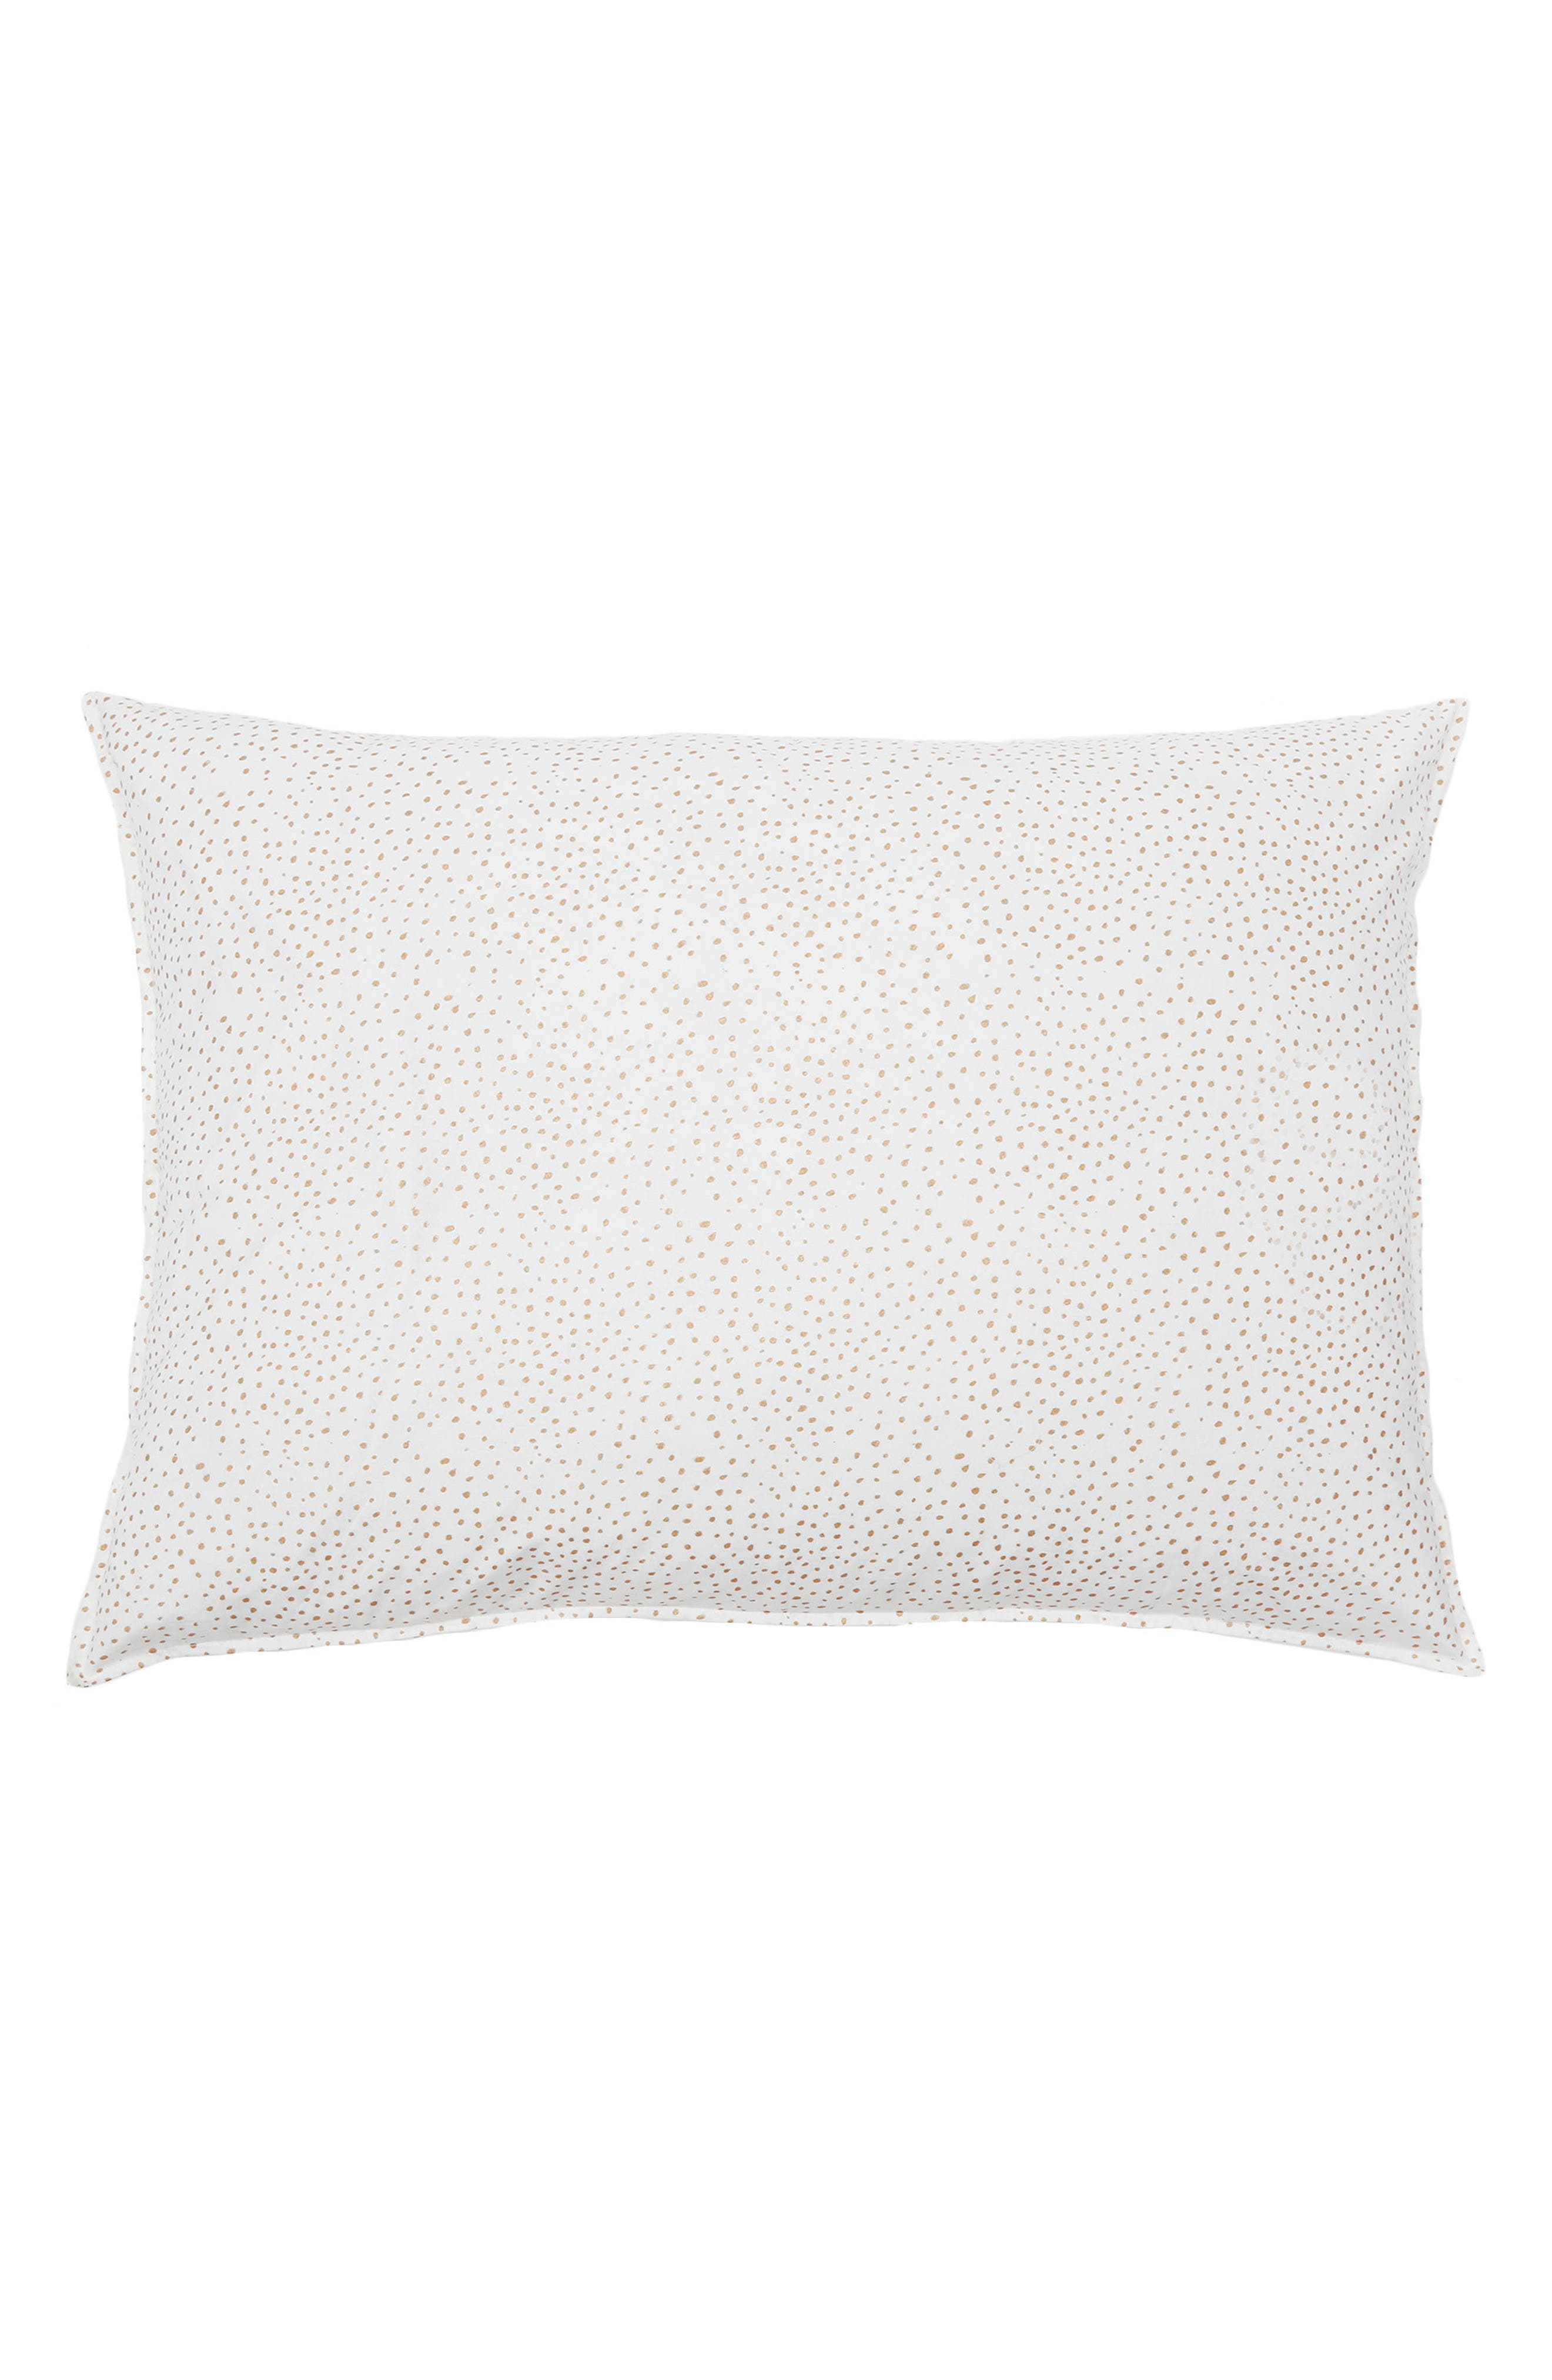 Dot Big Accent Pillow,                         Main,                         color, Gold